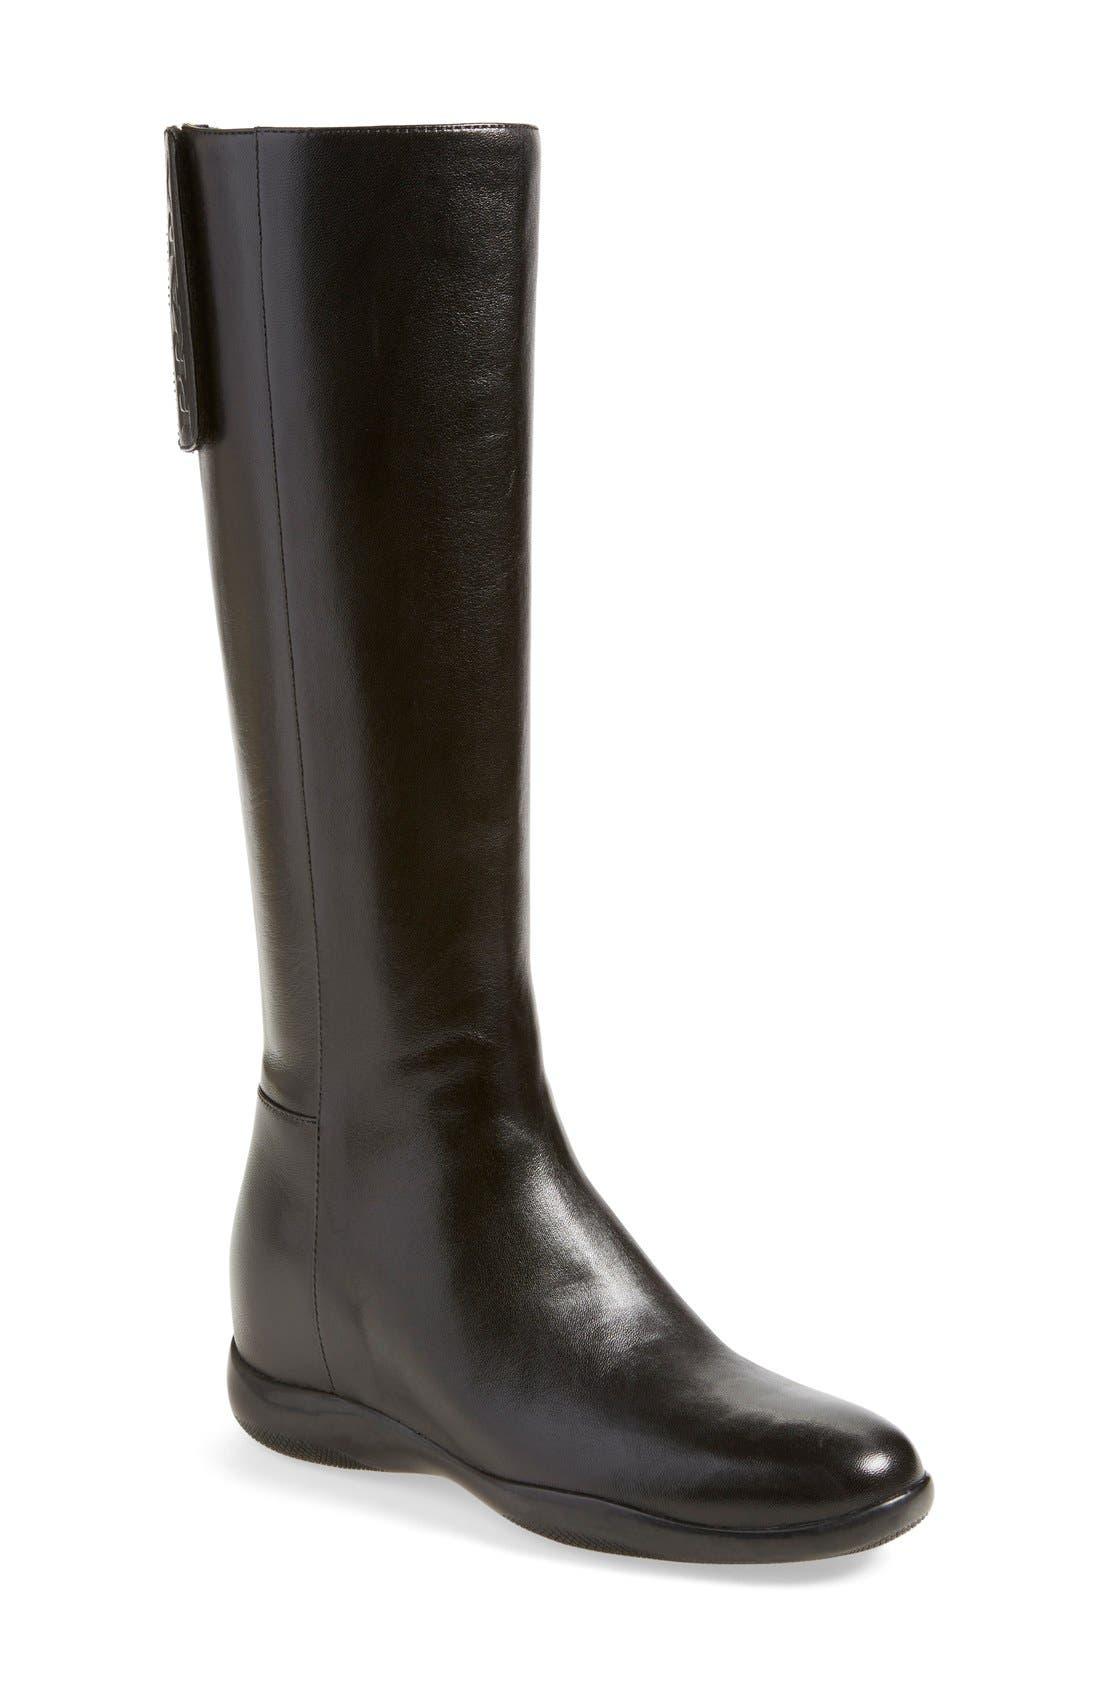 Alternate Image 1 Selected - Prada Leather Tall Boot